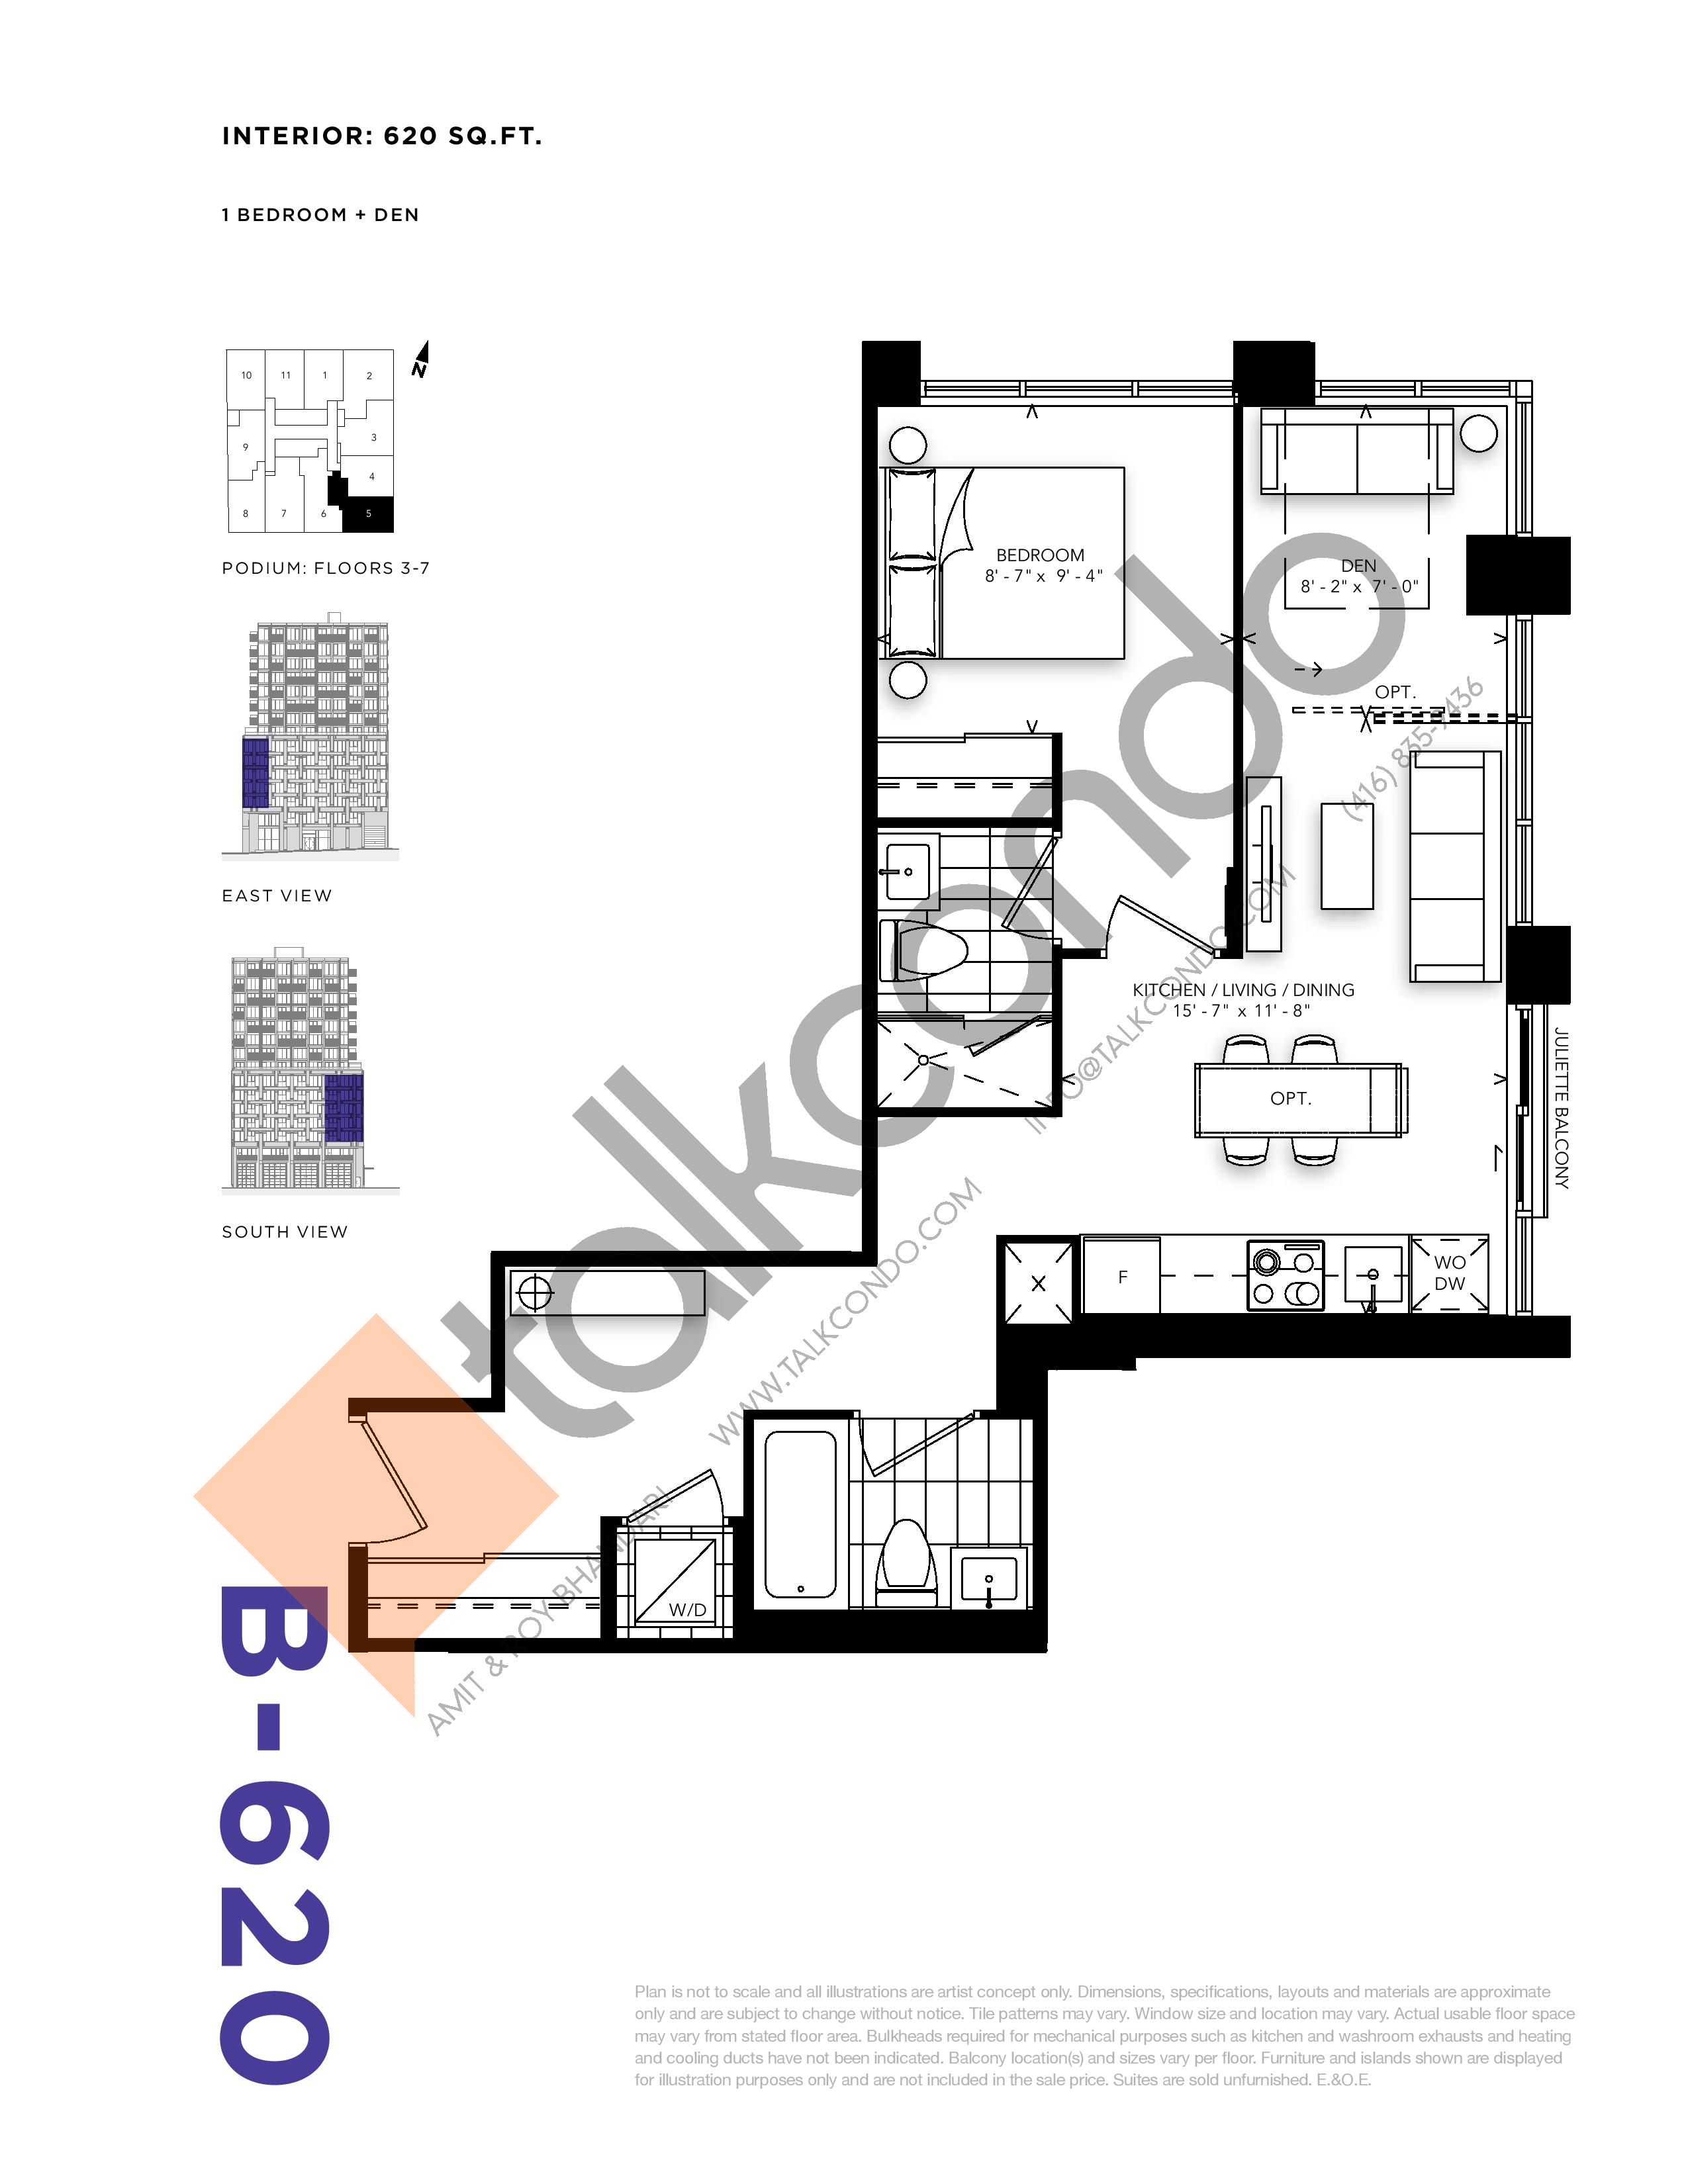 B-620 Floor Plan at RUSH Condos - 620 sq.ft